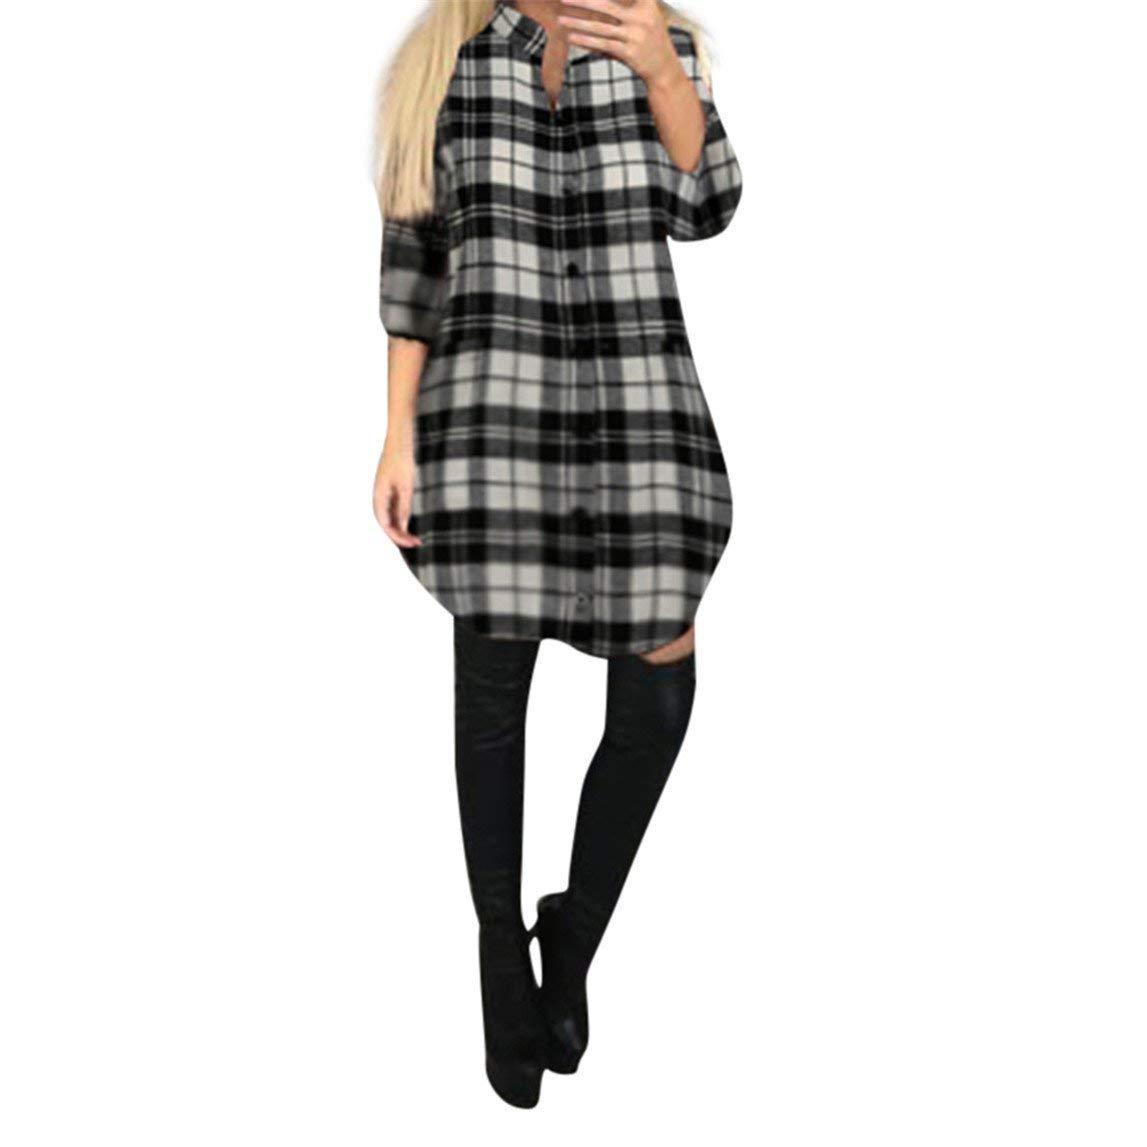 Nadition Dress Clearance !!! Womens Mini Dress Ladies Long Sleeve Plaid Lattice Dress